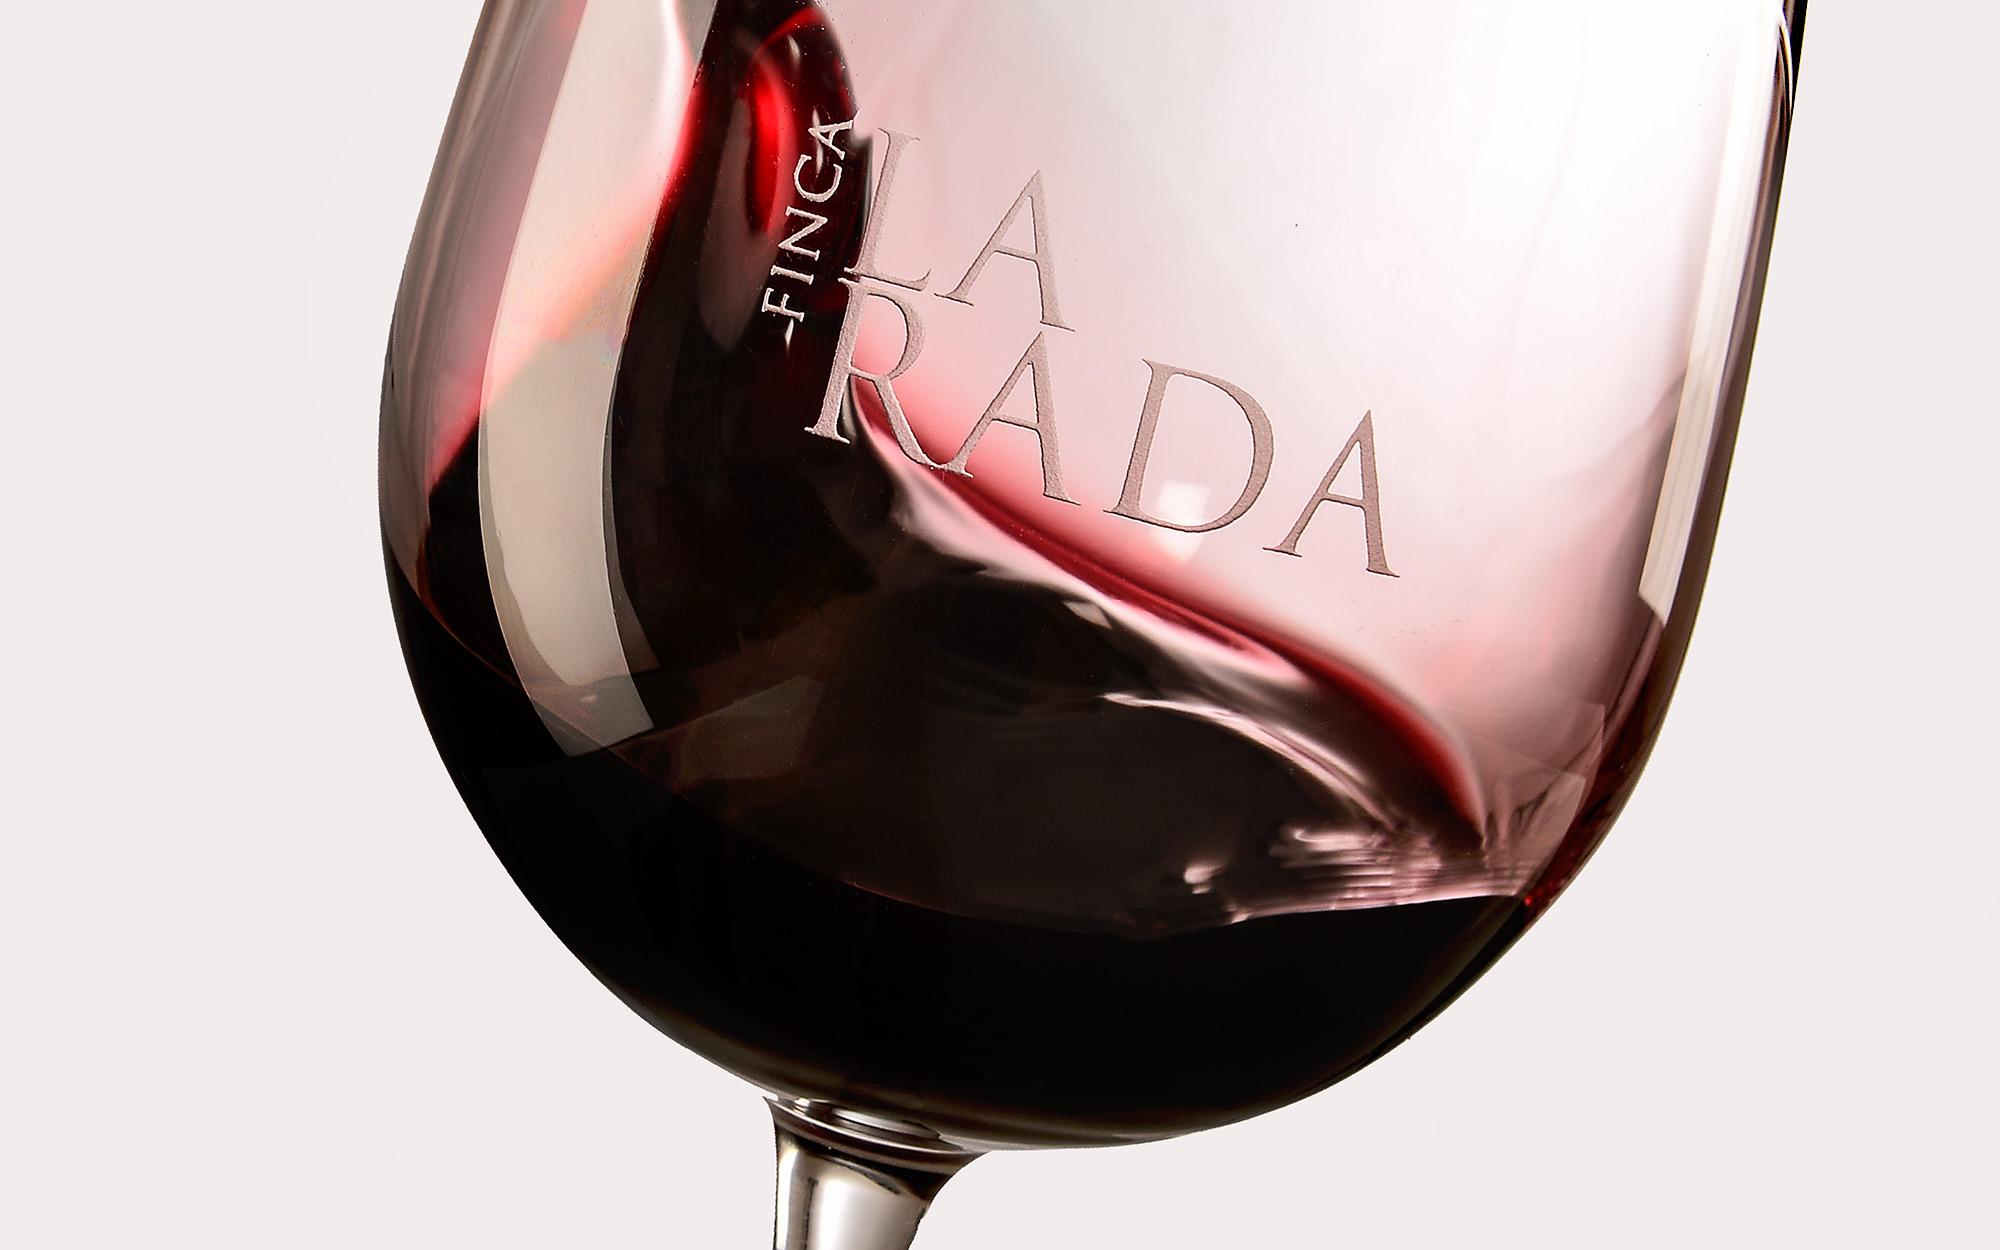 vinofinal